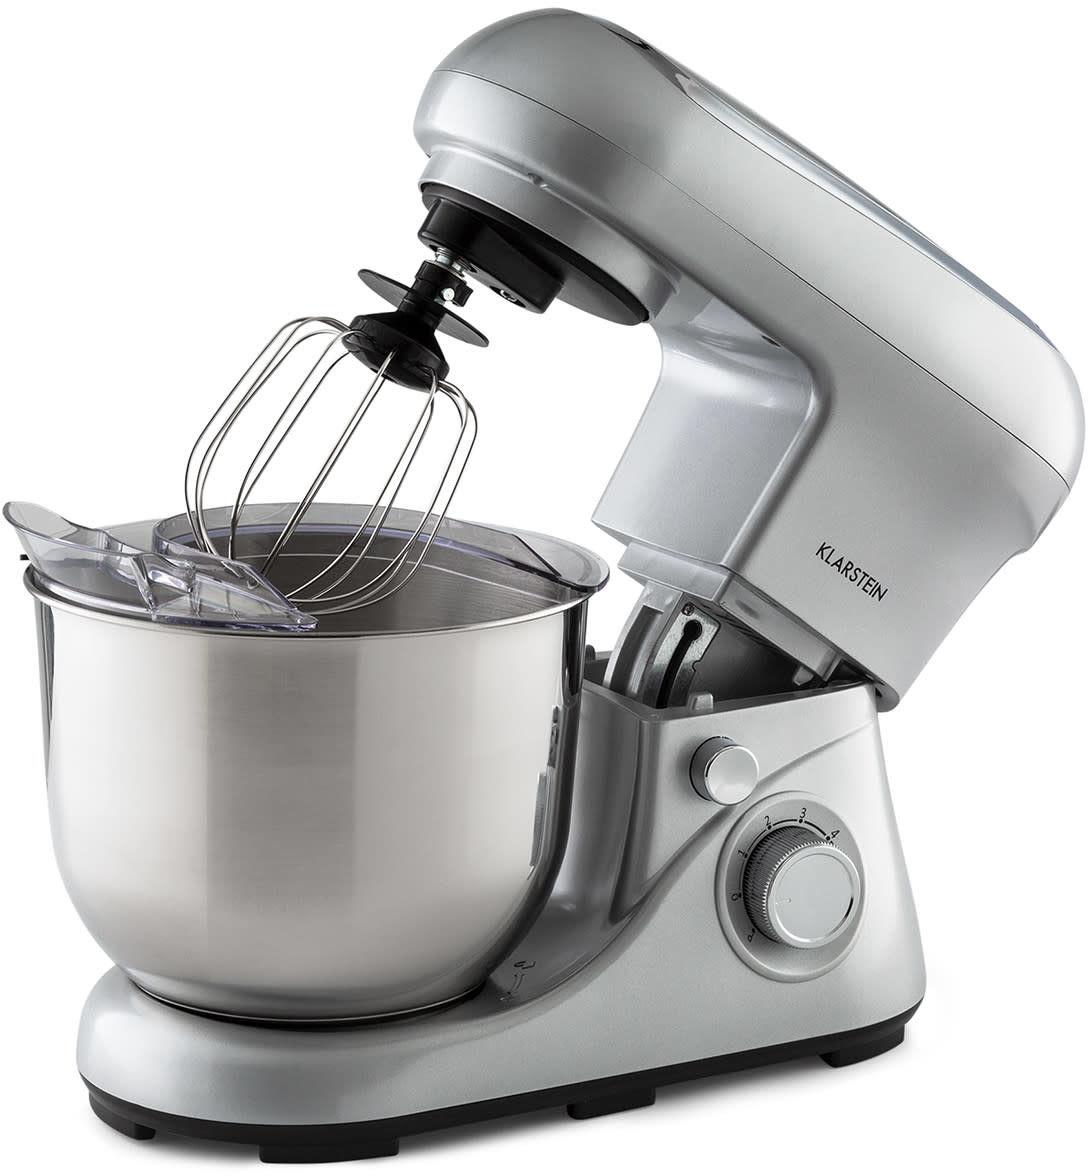 Klarstein Bella Pico 2G, robot kuchenny, 1300 W, 1,7 KM, 6 poziomów, 5 l